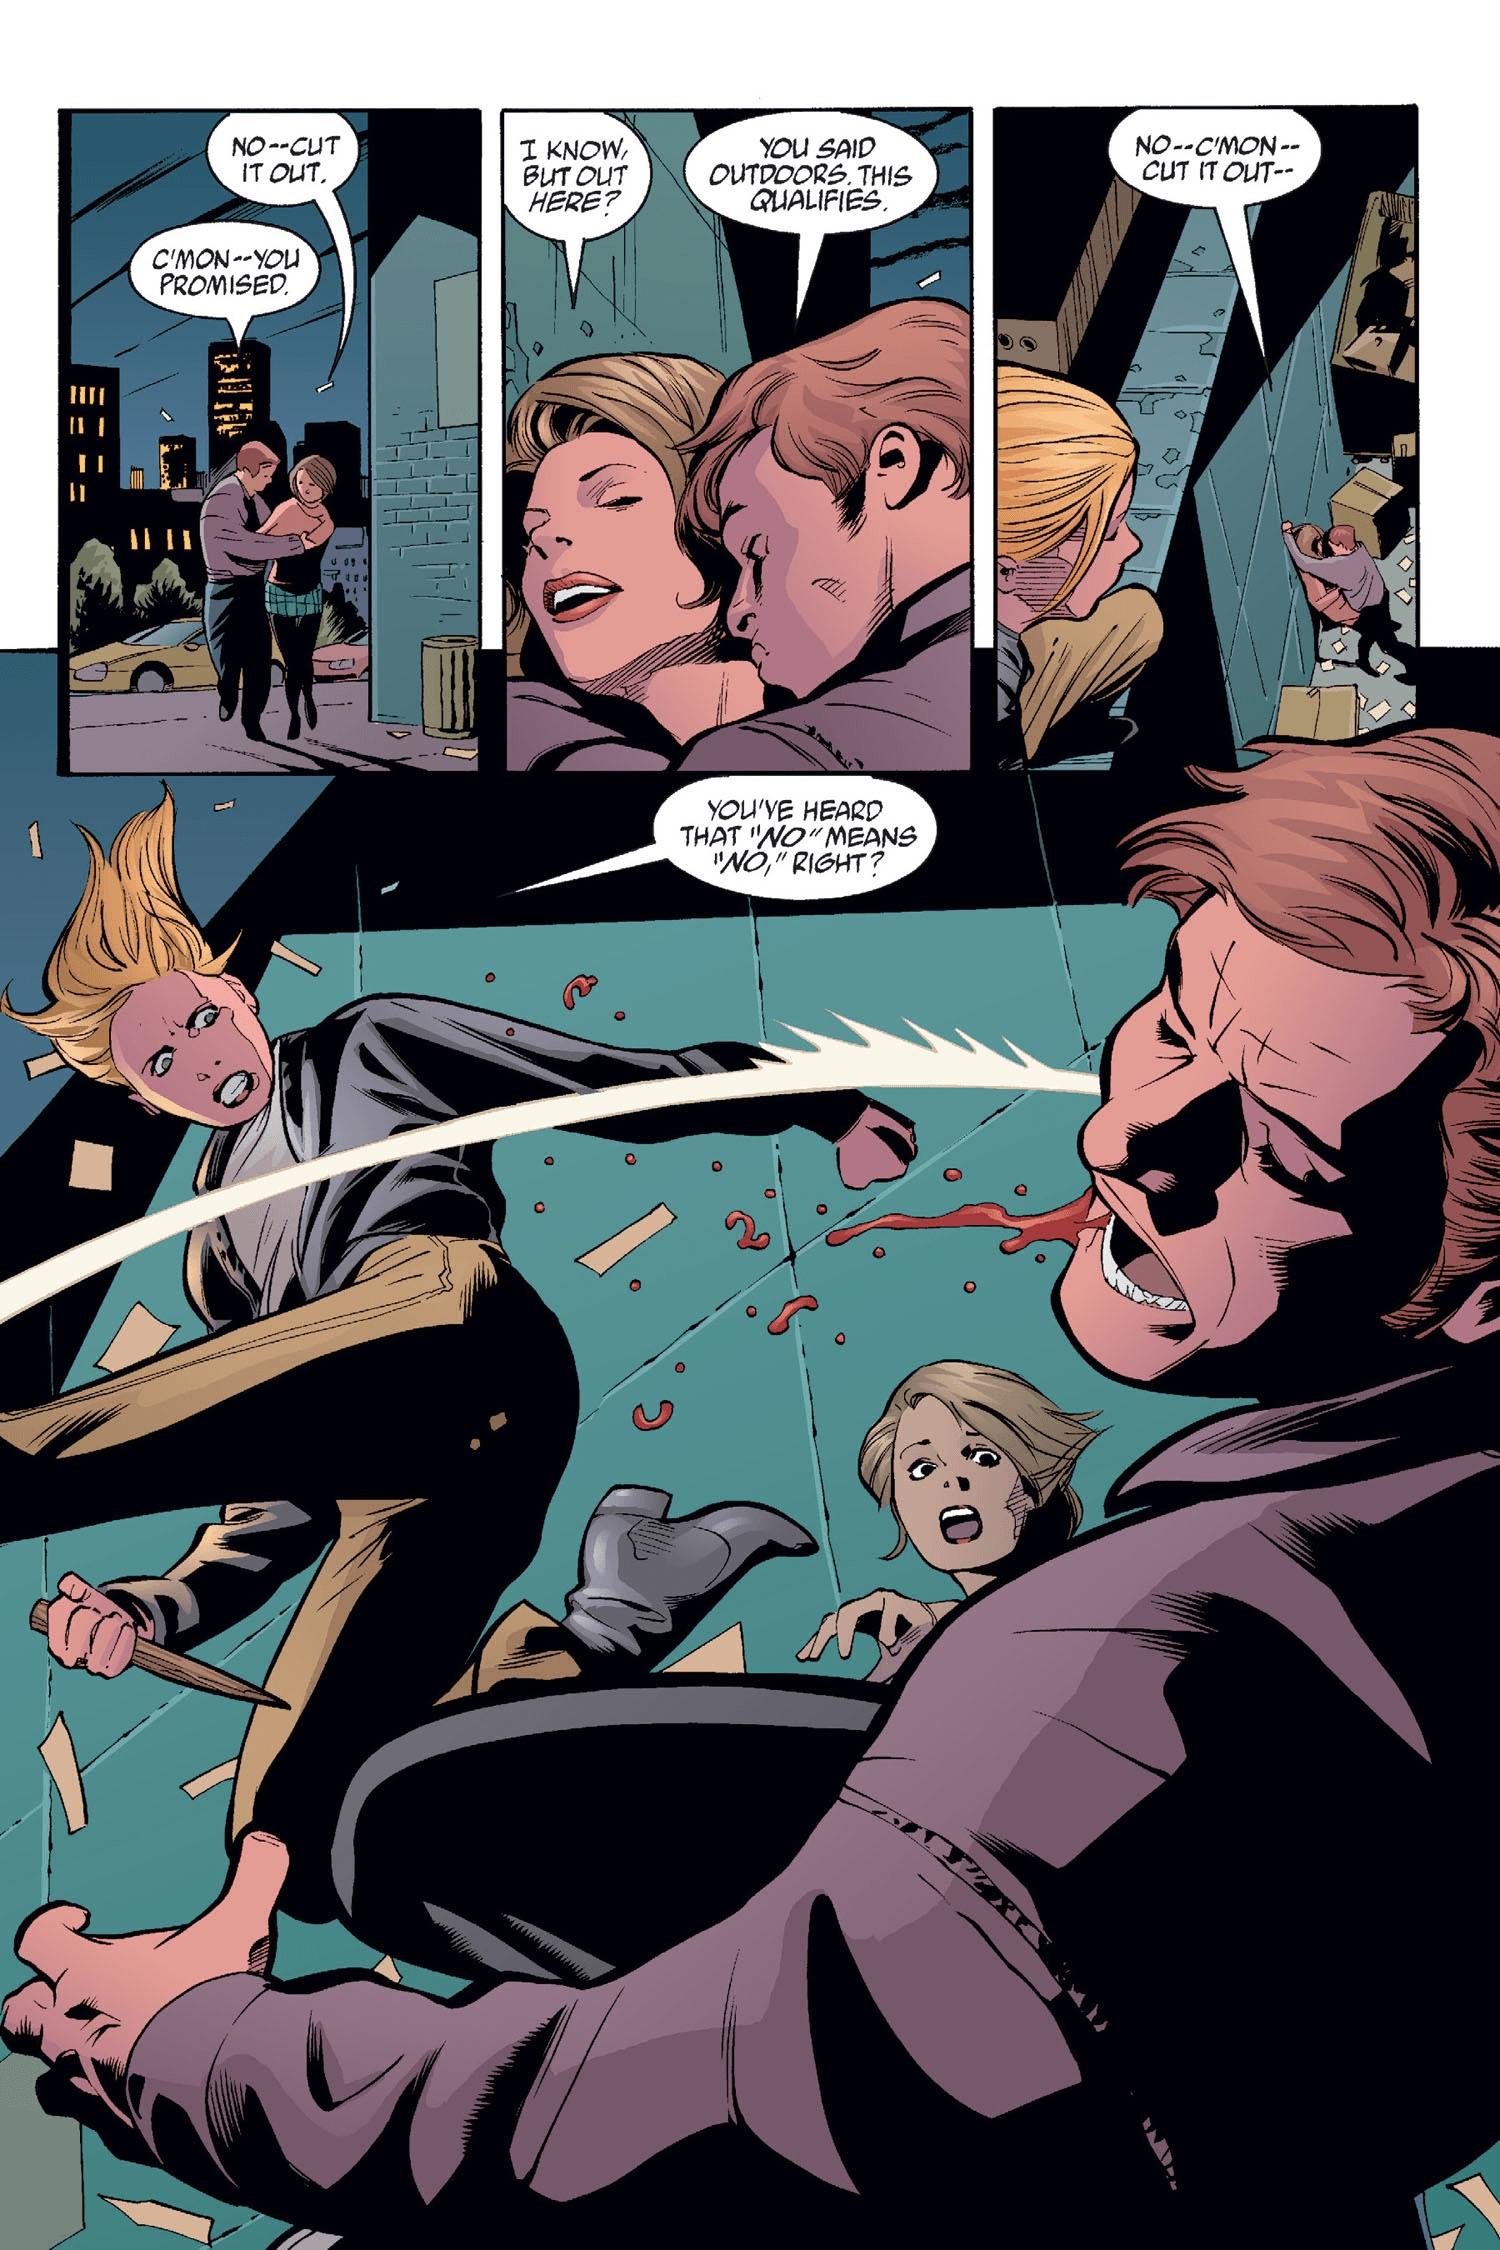 Read online Buffy the Vampire Slayer: Omnibus comic -  Issue # TPB 2 - 47